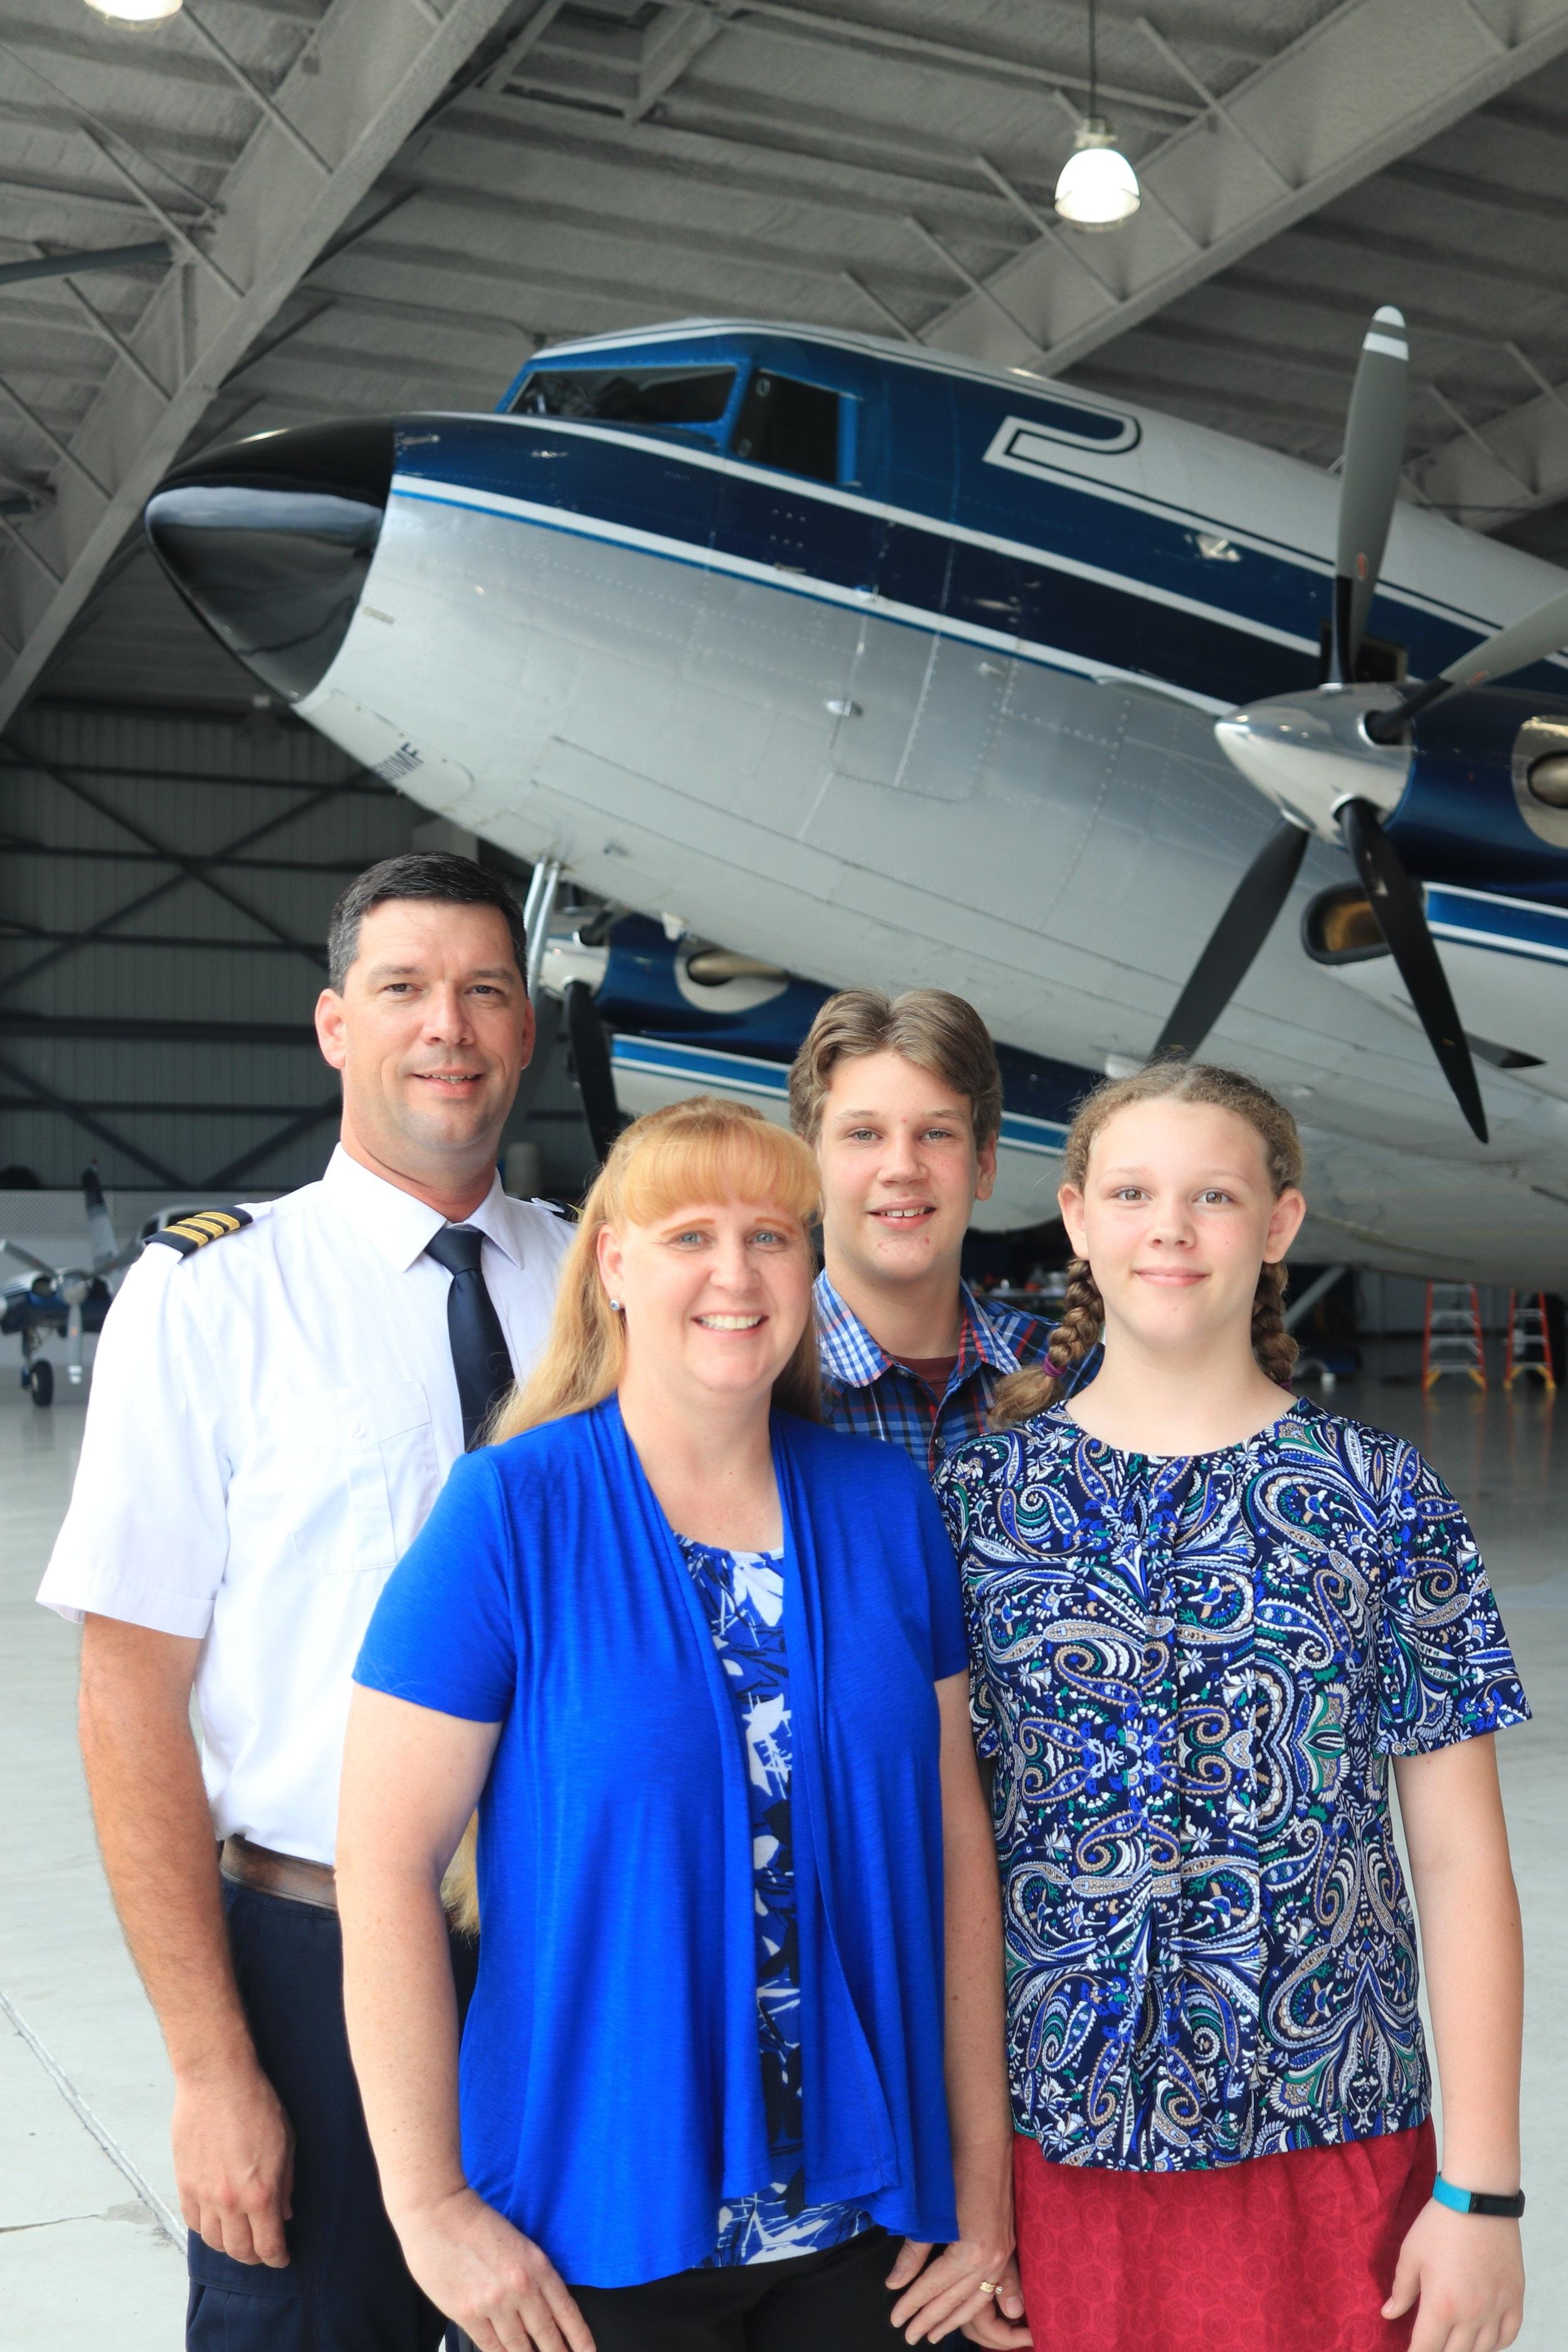 The Karnes Family